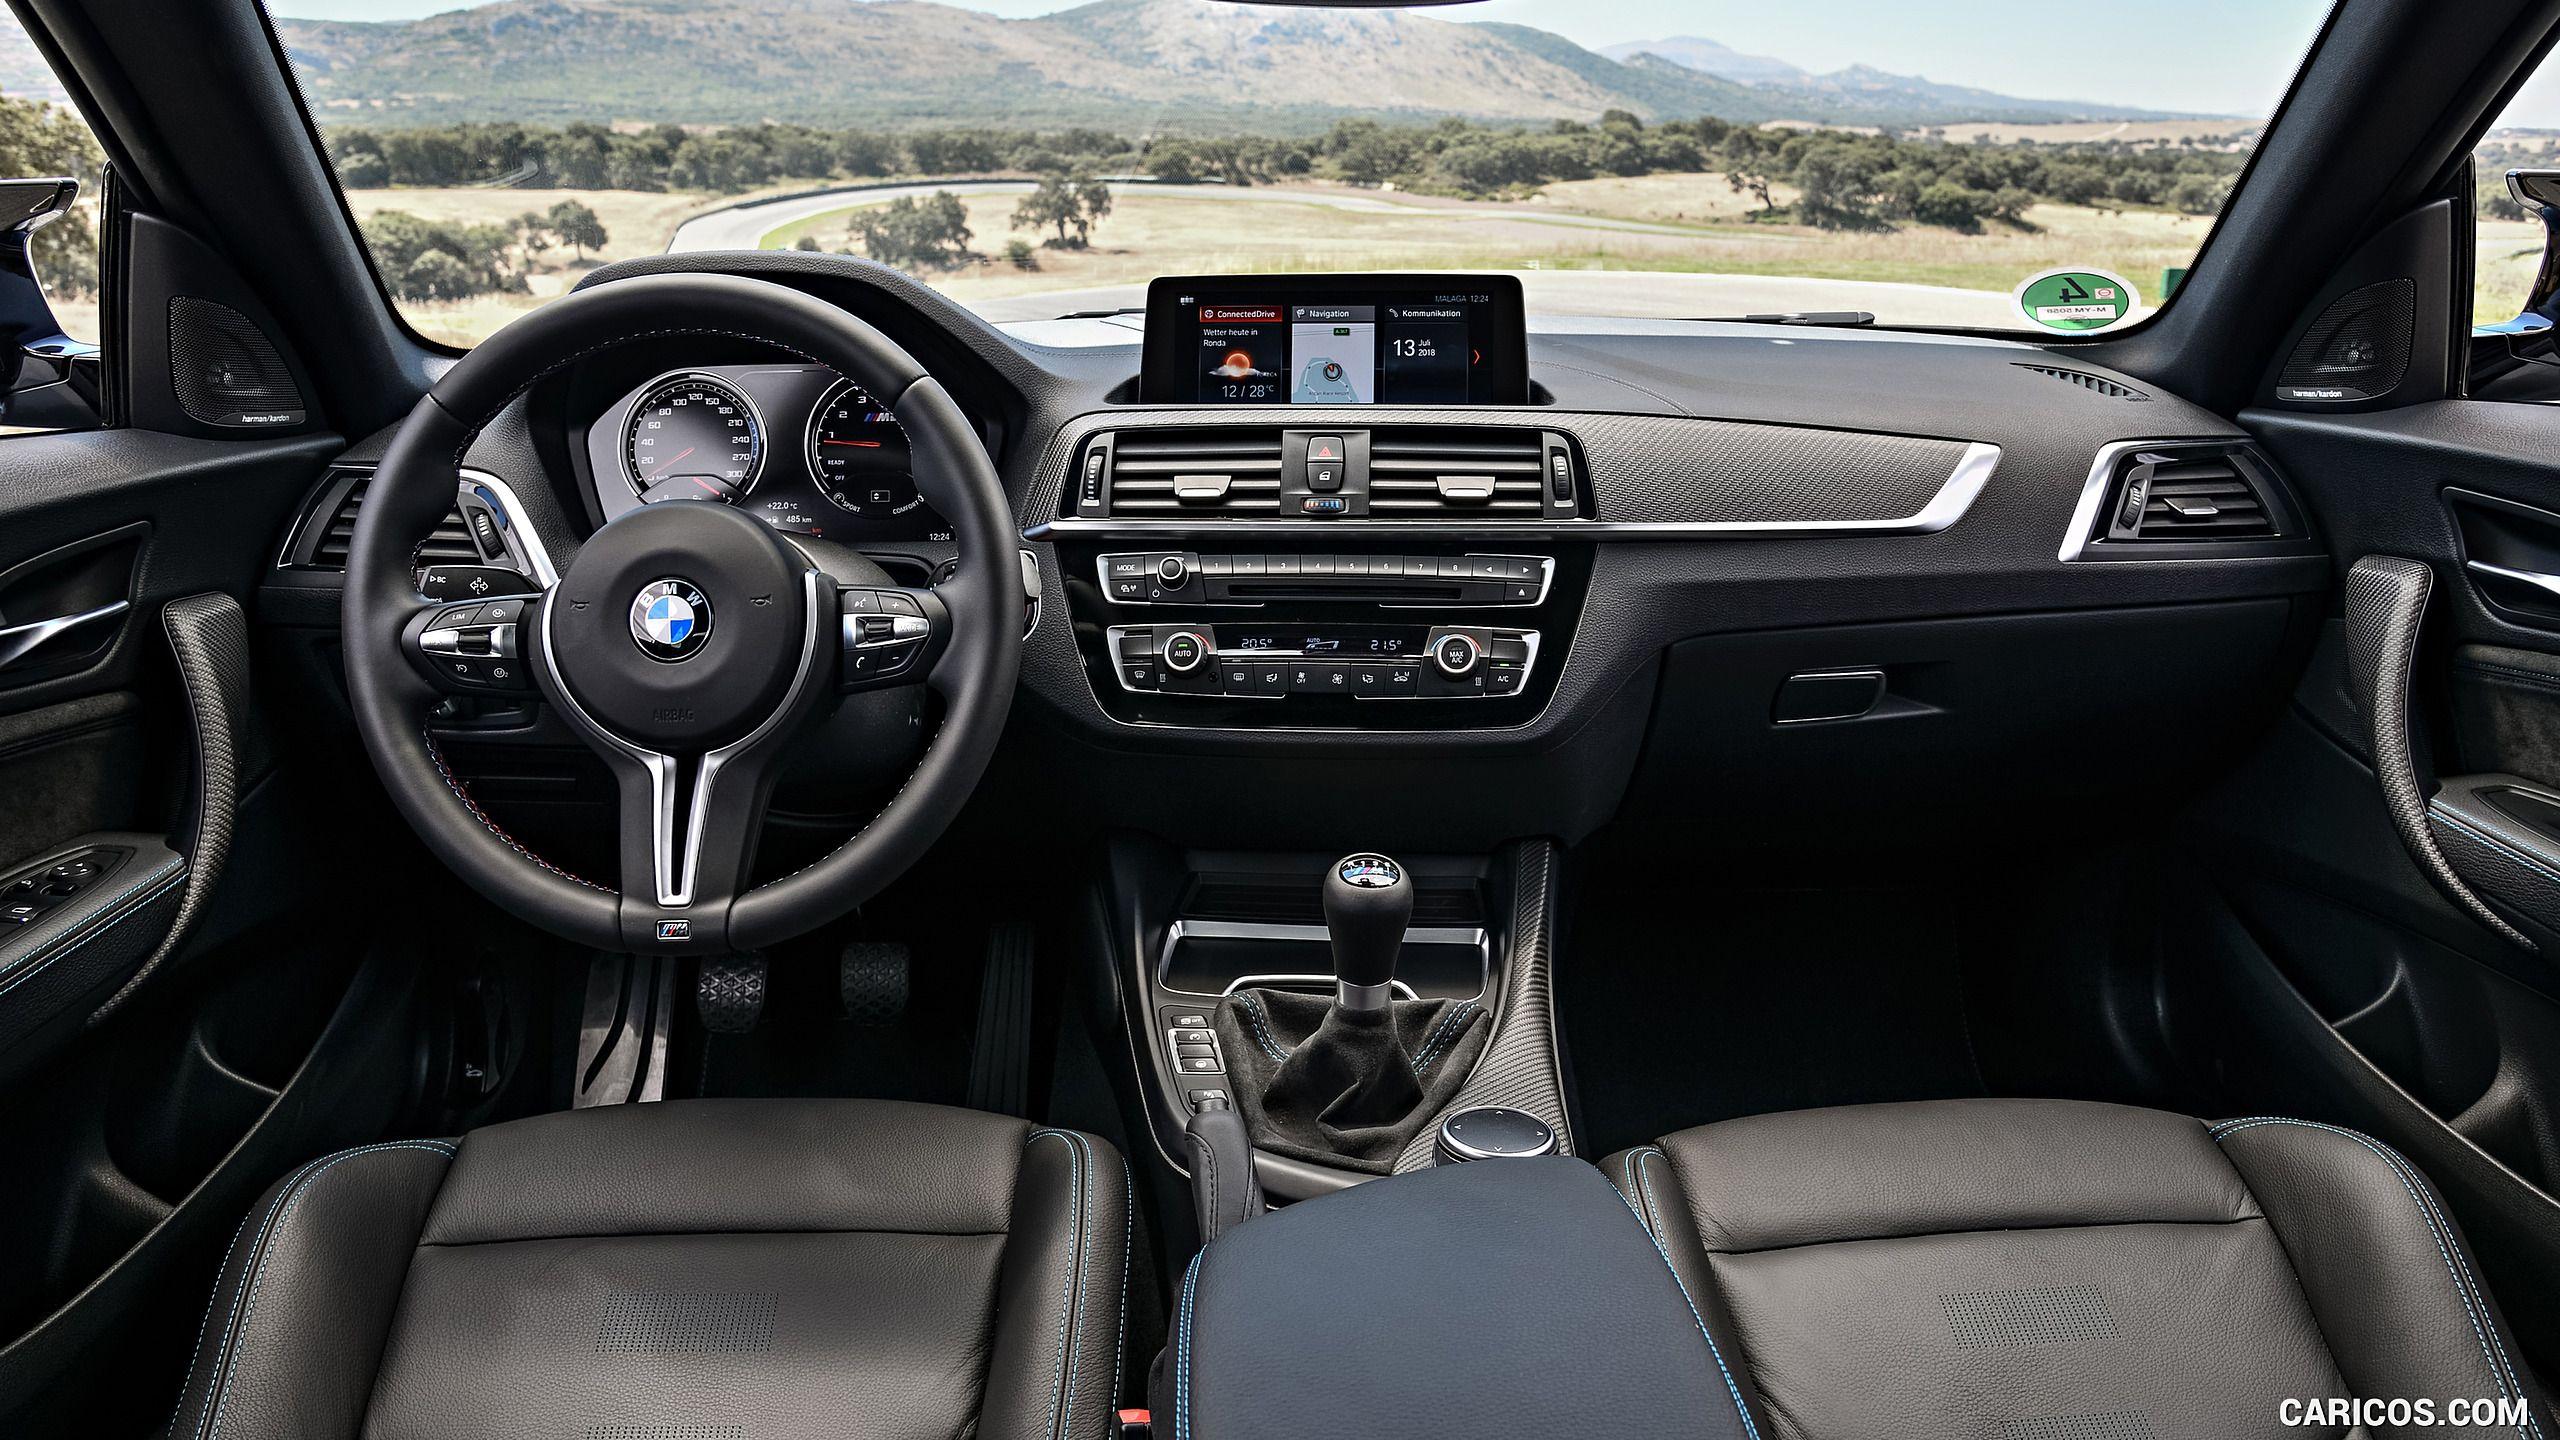 2019 Bmw M2 Competition Interior Cockpit Hd Bmw M2 Bmw